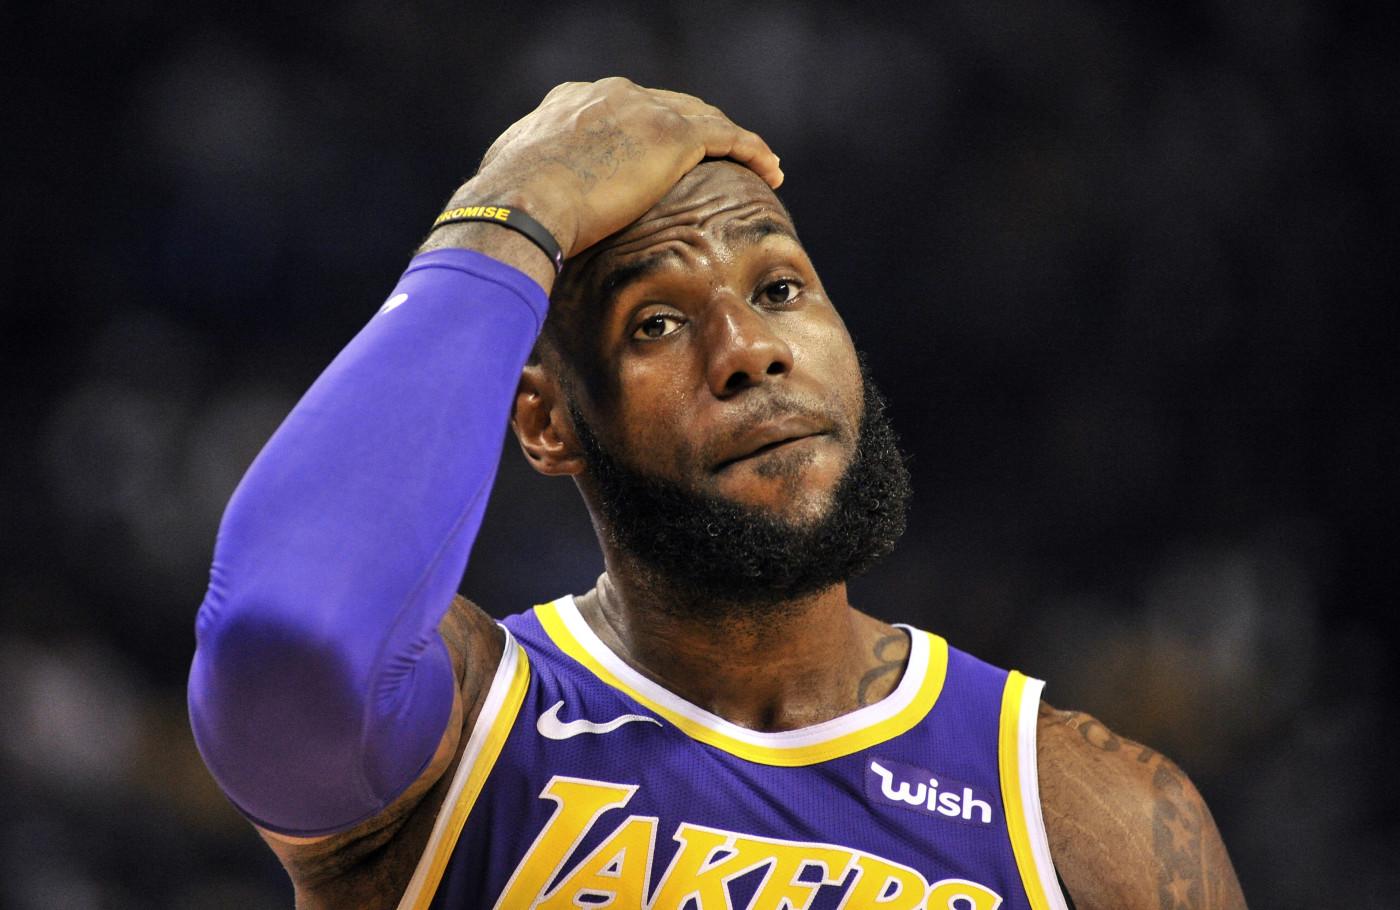 LeBron James Grizzlies Lakers 2019